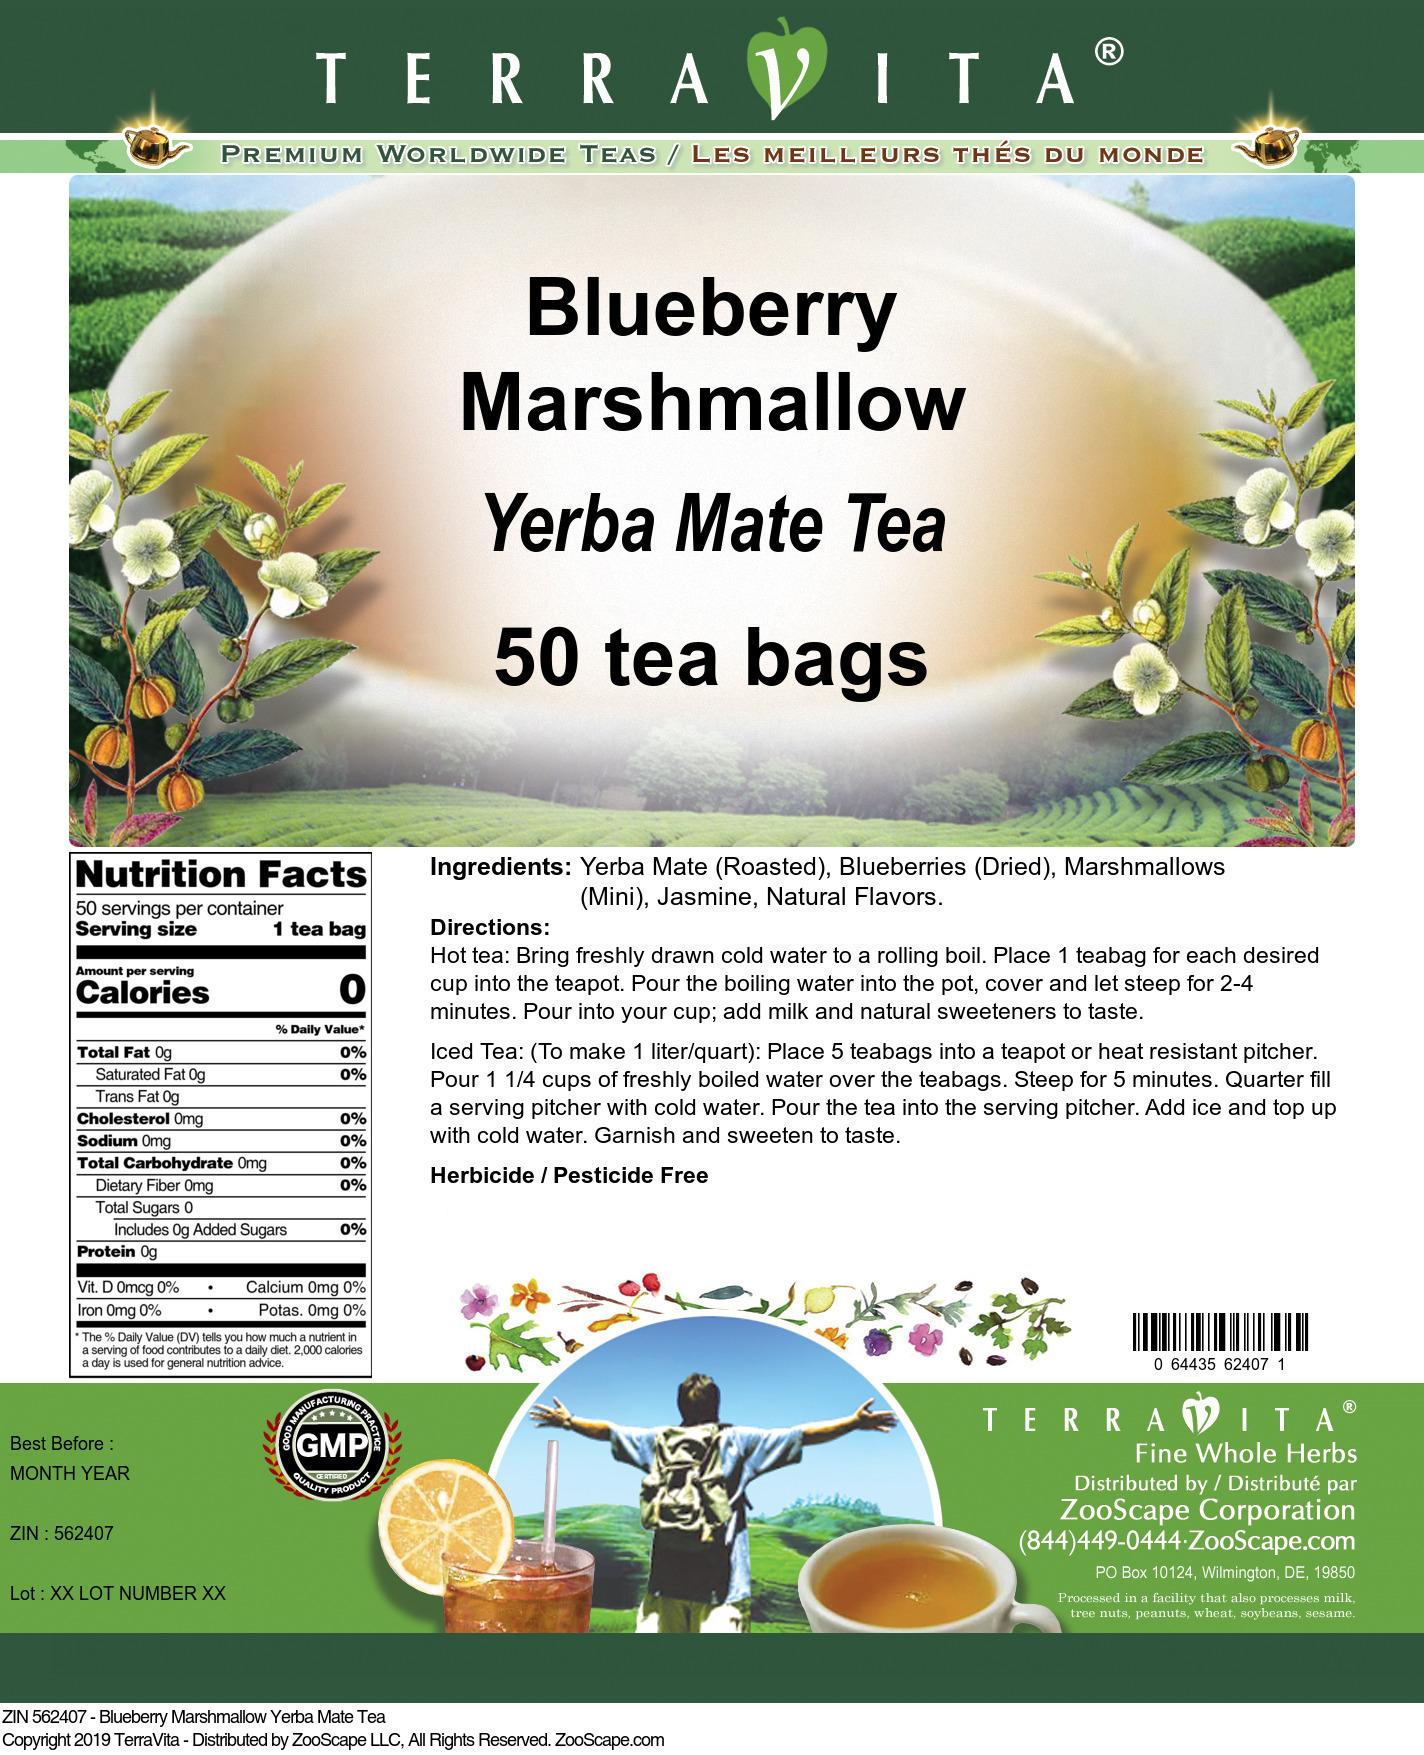 Blueberry Marshmallow Yerba Mate